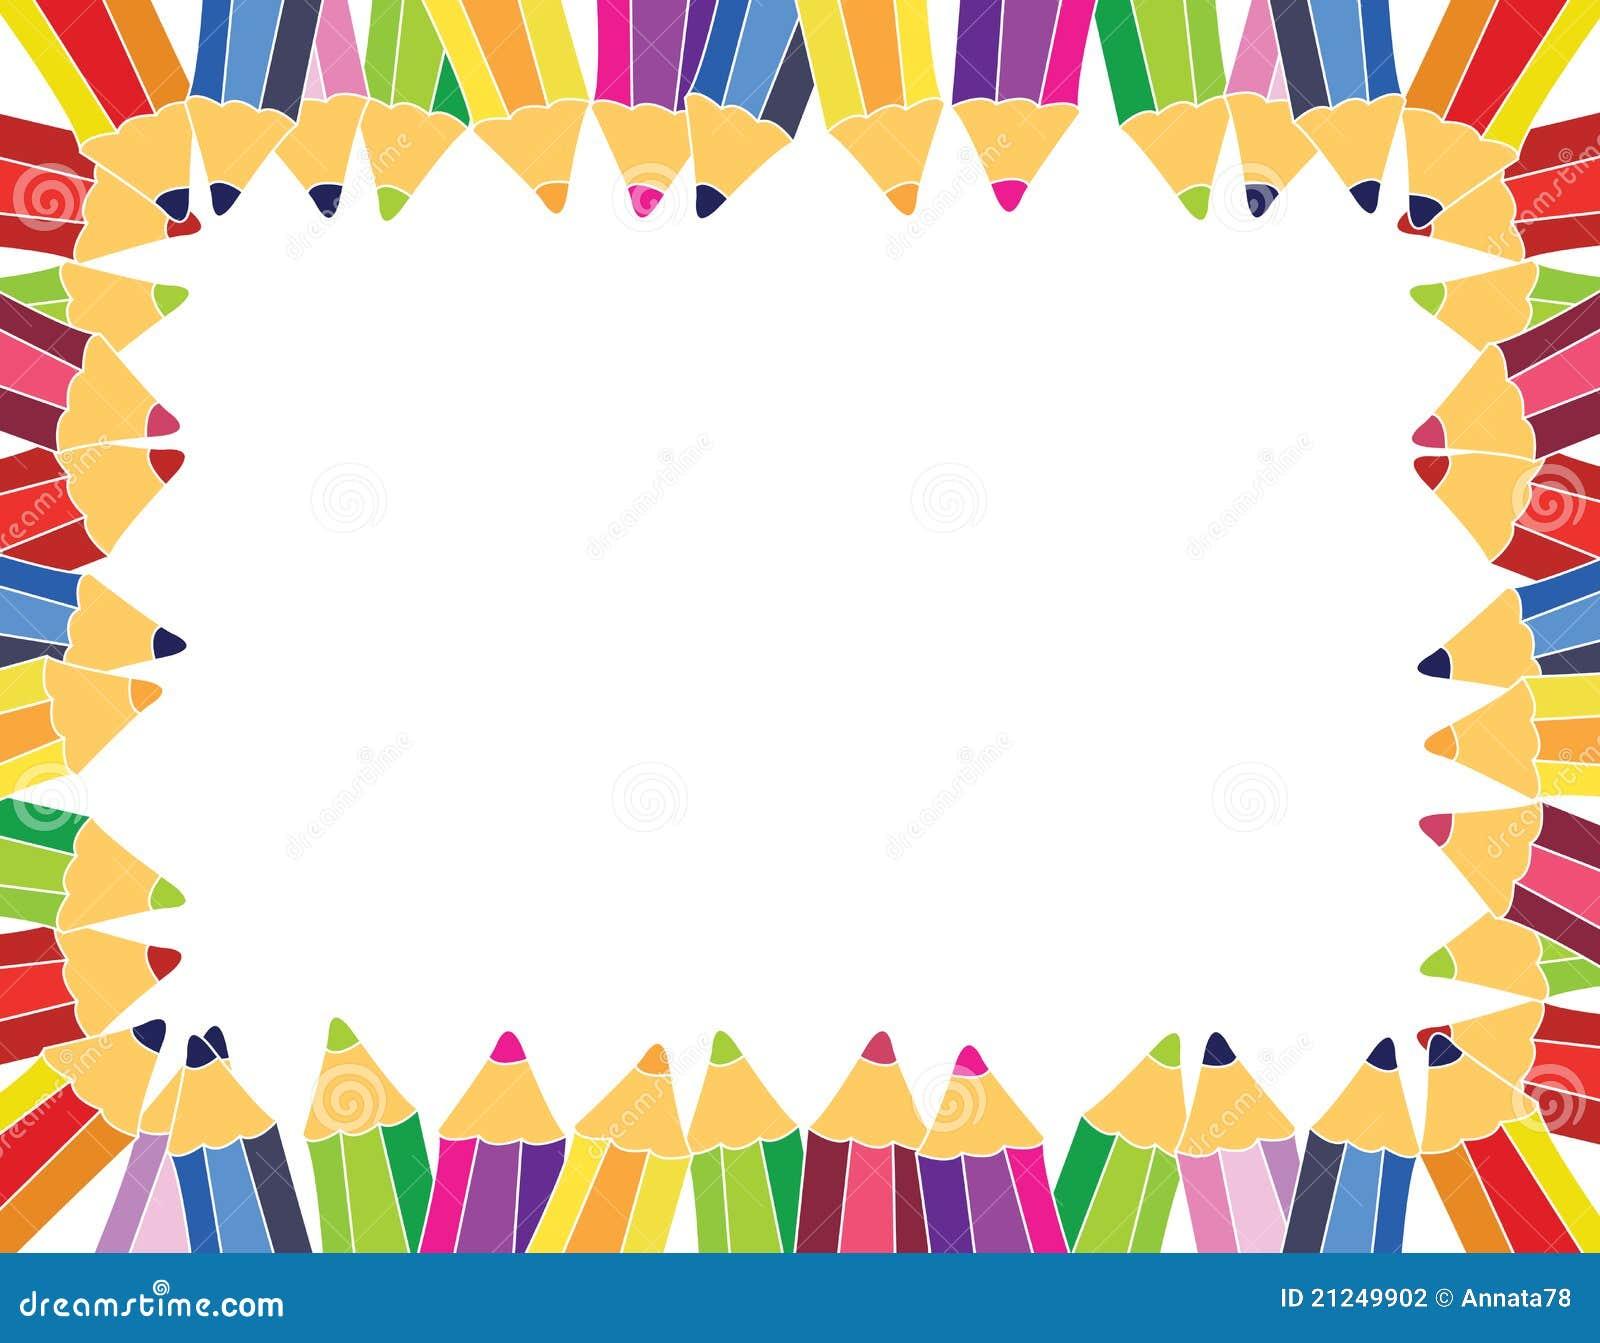 Stock Photography Pencils Frame Image21249902 on Crayon Border